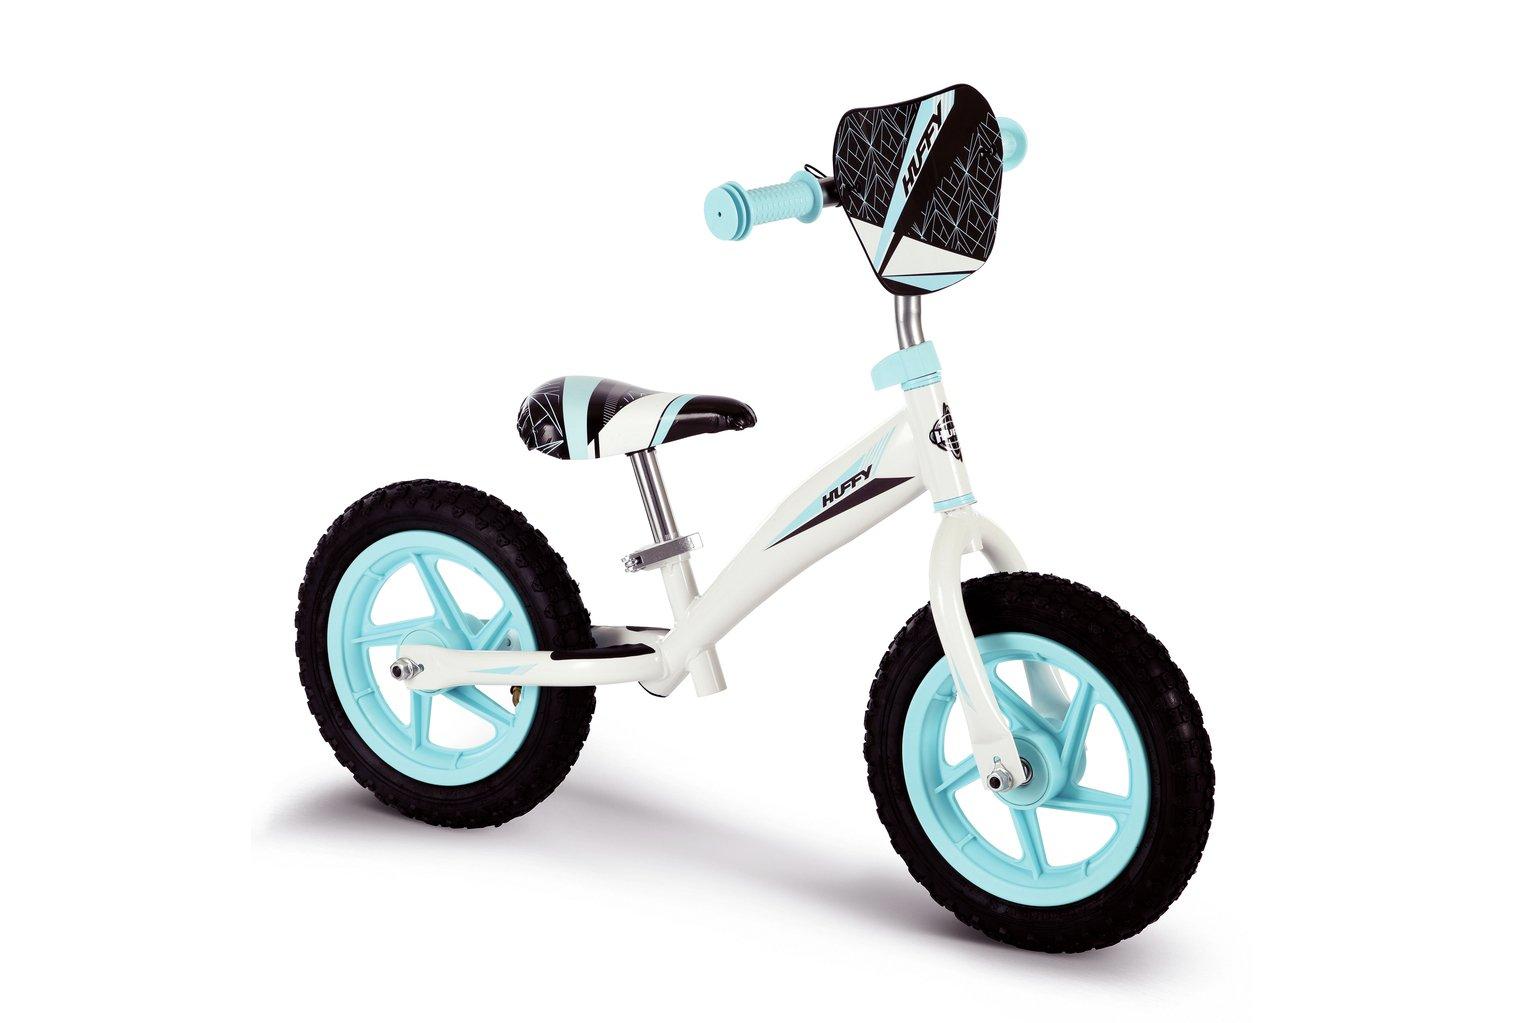 Huffy 12inch Wheel Size Kids Bike